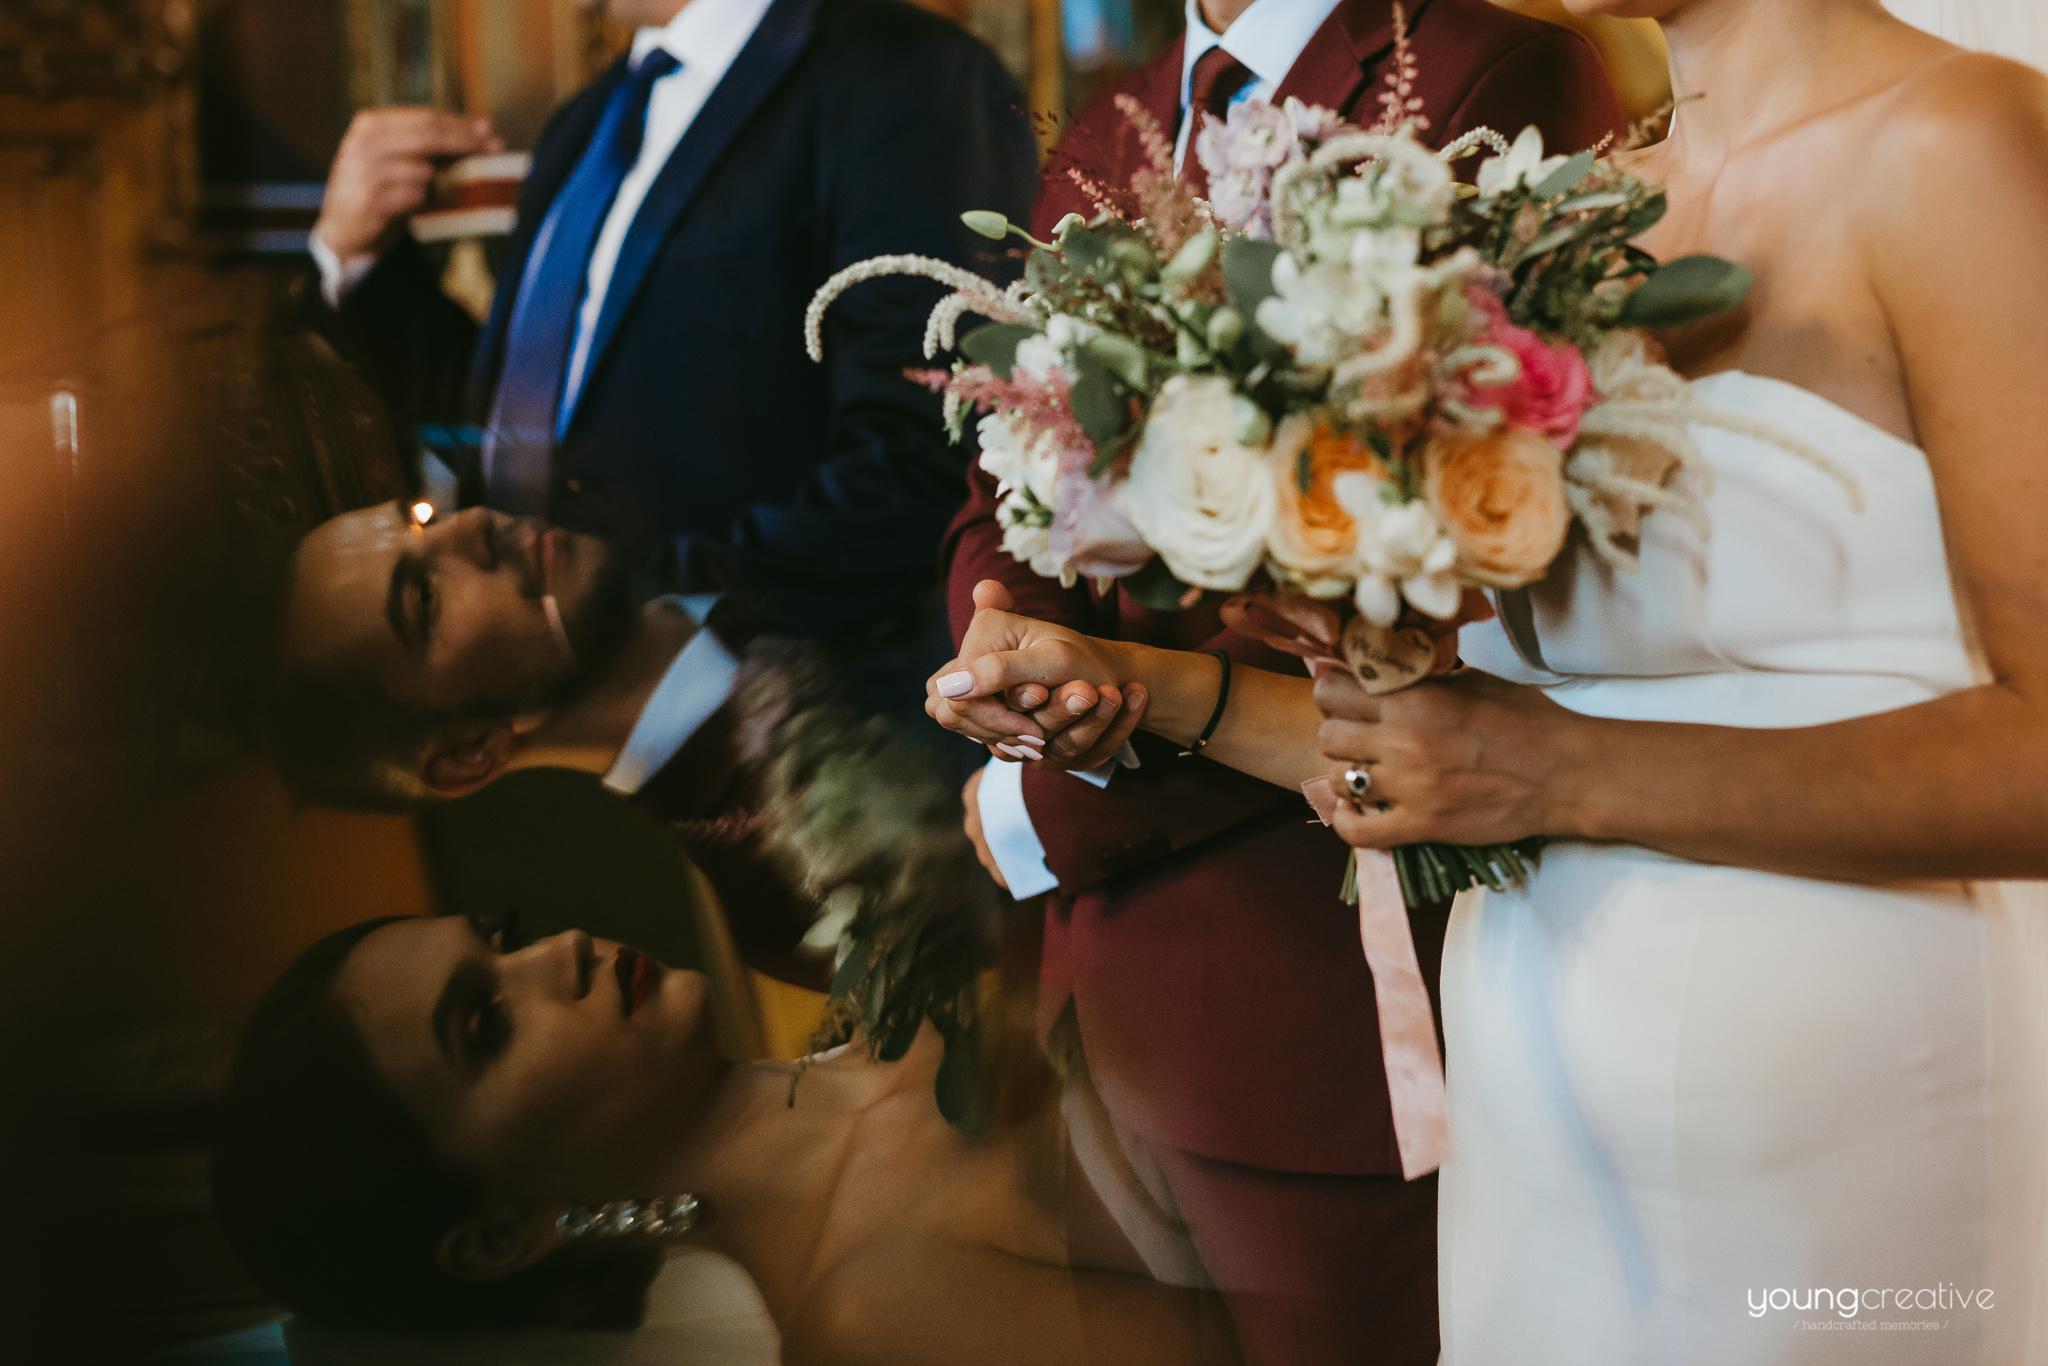 Bianca & Andrei | youngcreative.info media © Dan Filipciuc, Cristina Bejan | fotografie de nunta Suceava